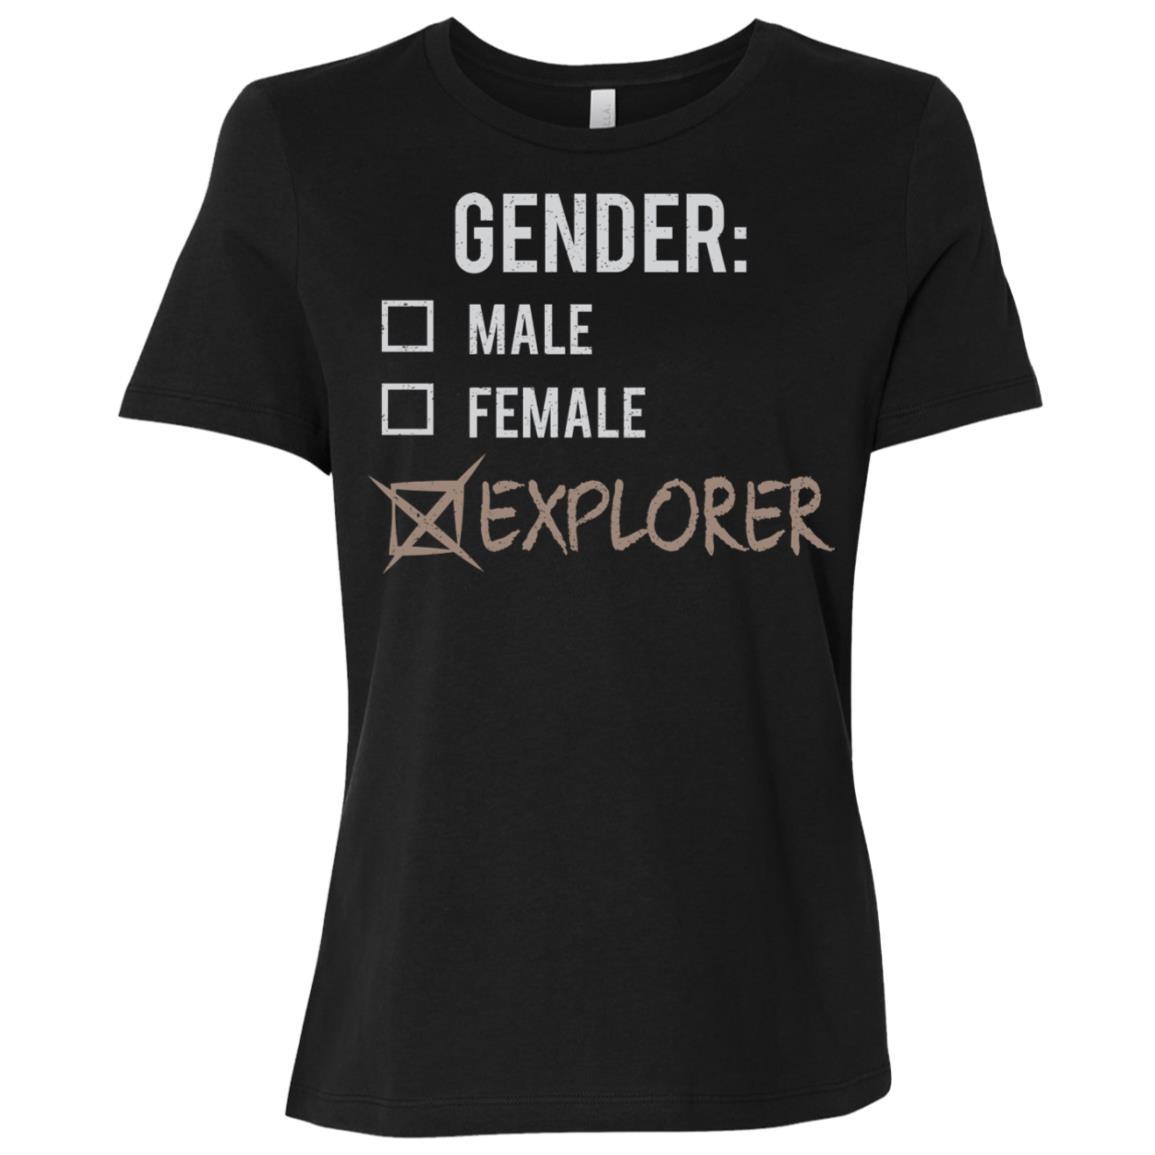 Male Female Explorer Gender Nonbinary Trans Women Short Sleeve T-Shirt